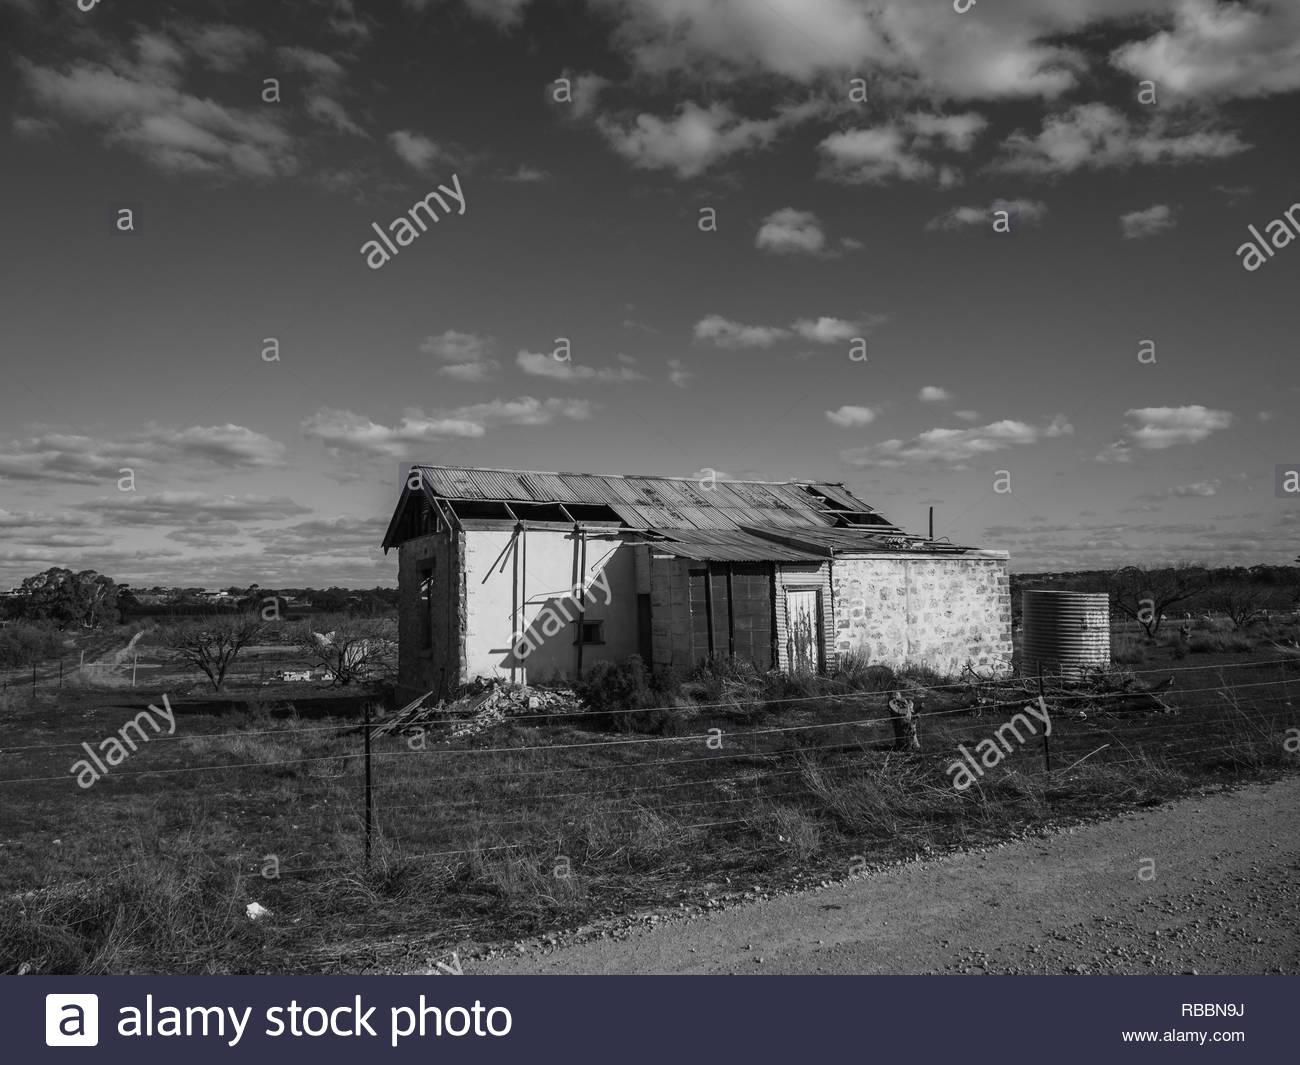 Old Stone Farmhouse near Cadell, SA - Black and White Stock Photo